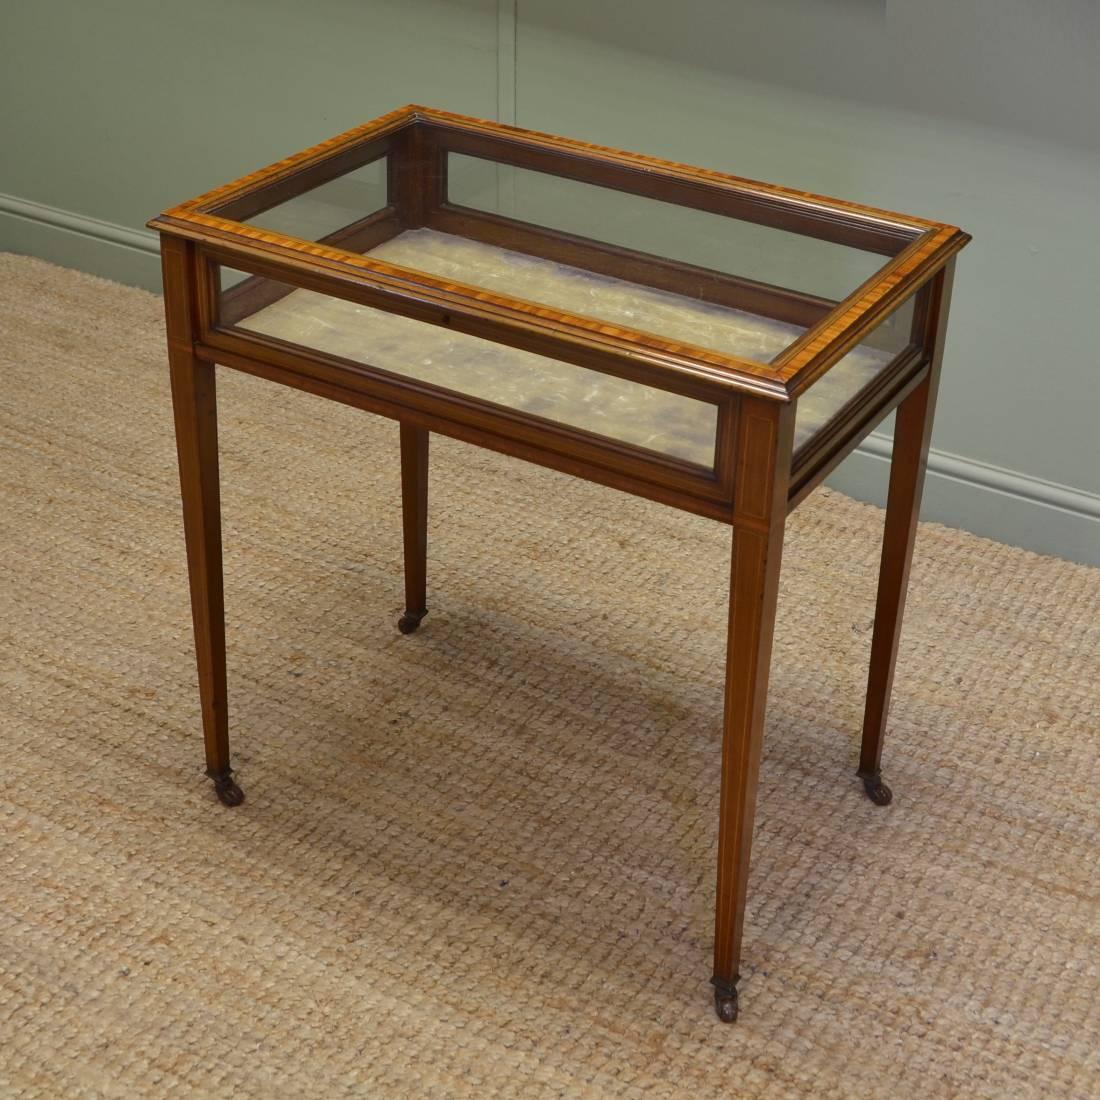 Elegant edwardian mahogany glazed antique bijouterie table antiques world - Vintage pieces of furniture old times elegance ...